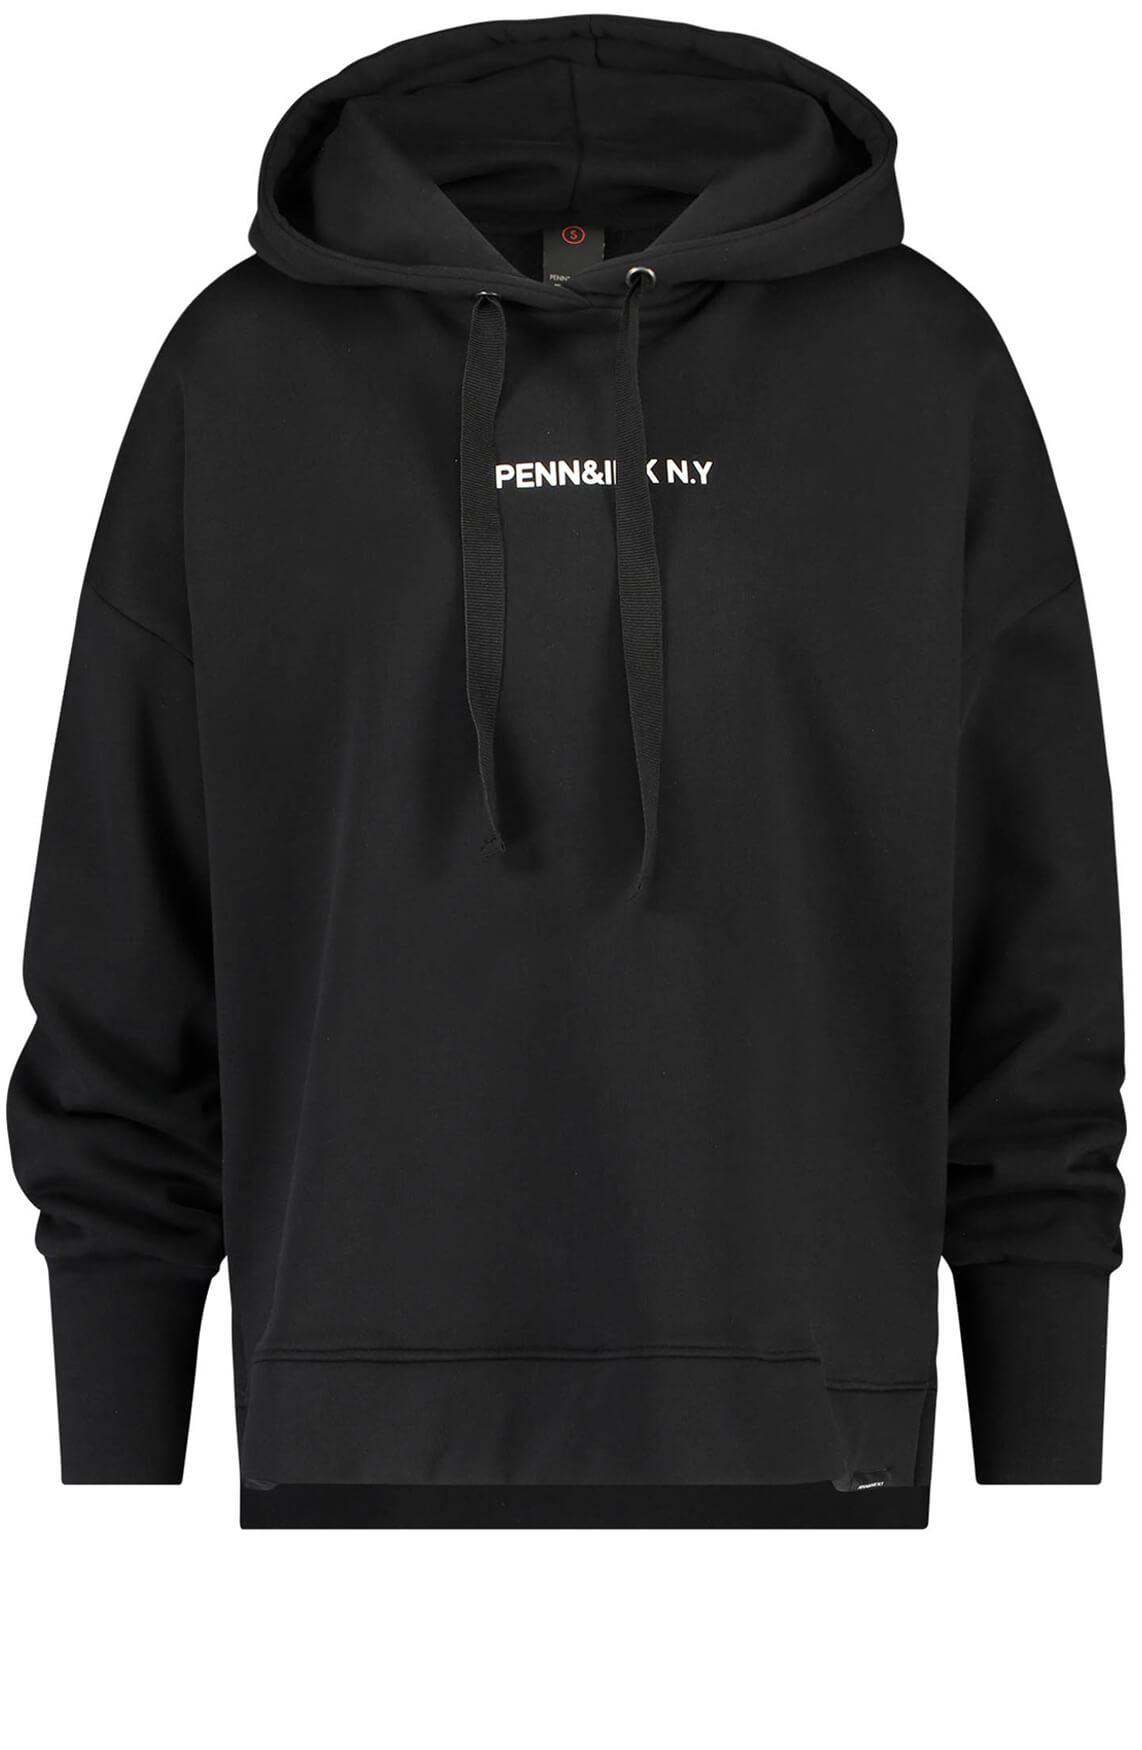 Penn & Ink Dames Sweater met tekstopdruk zwart